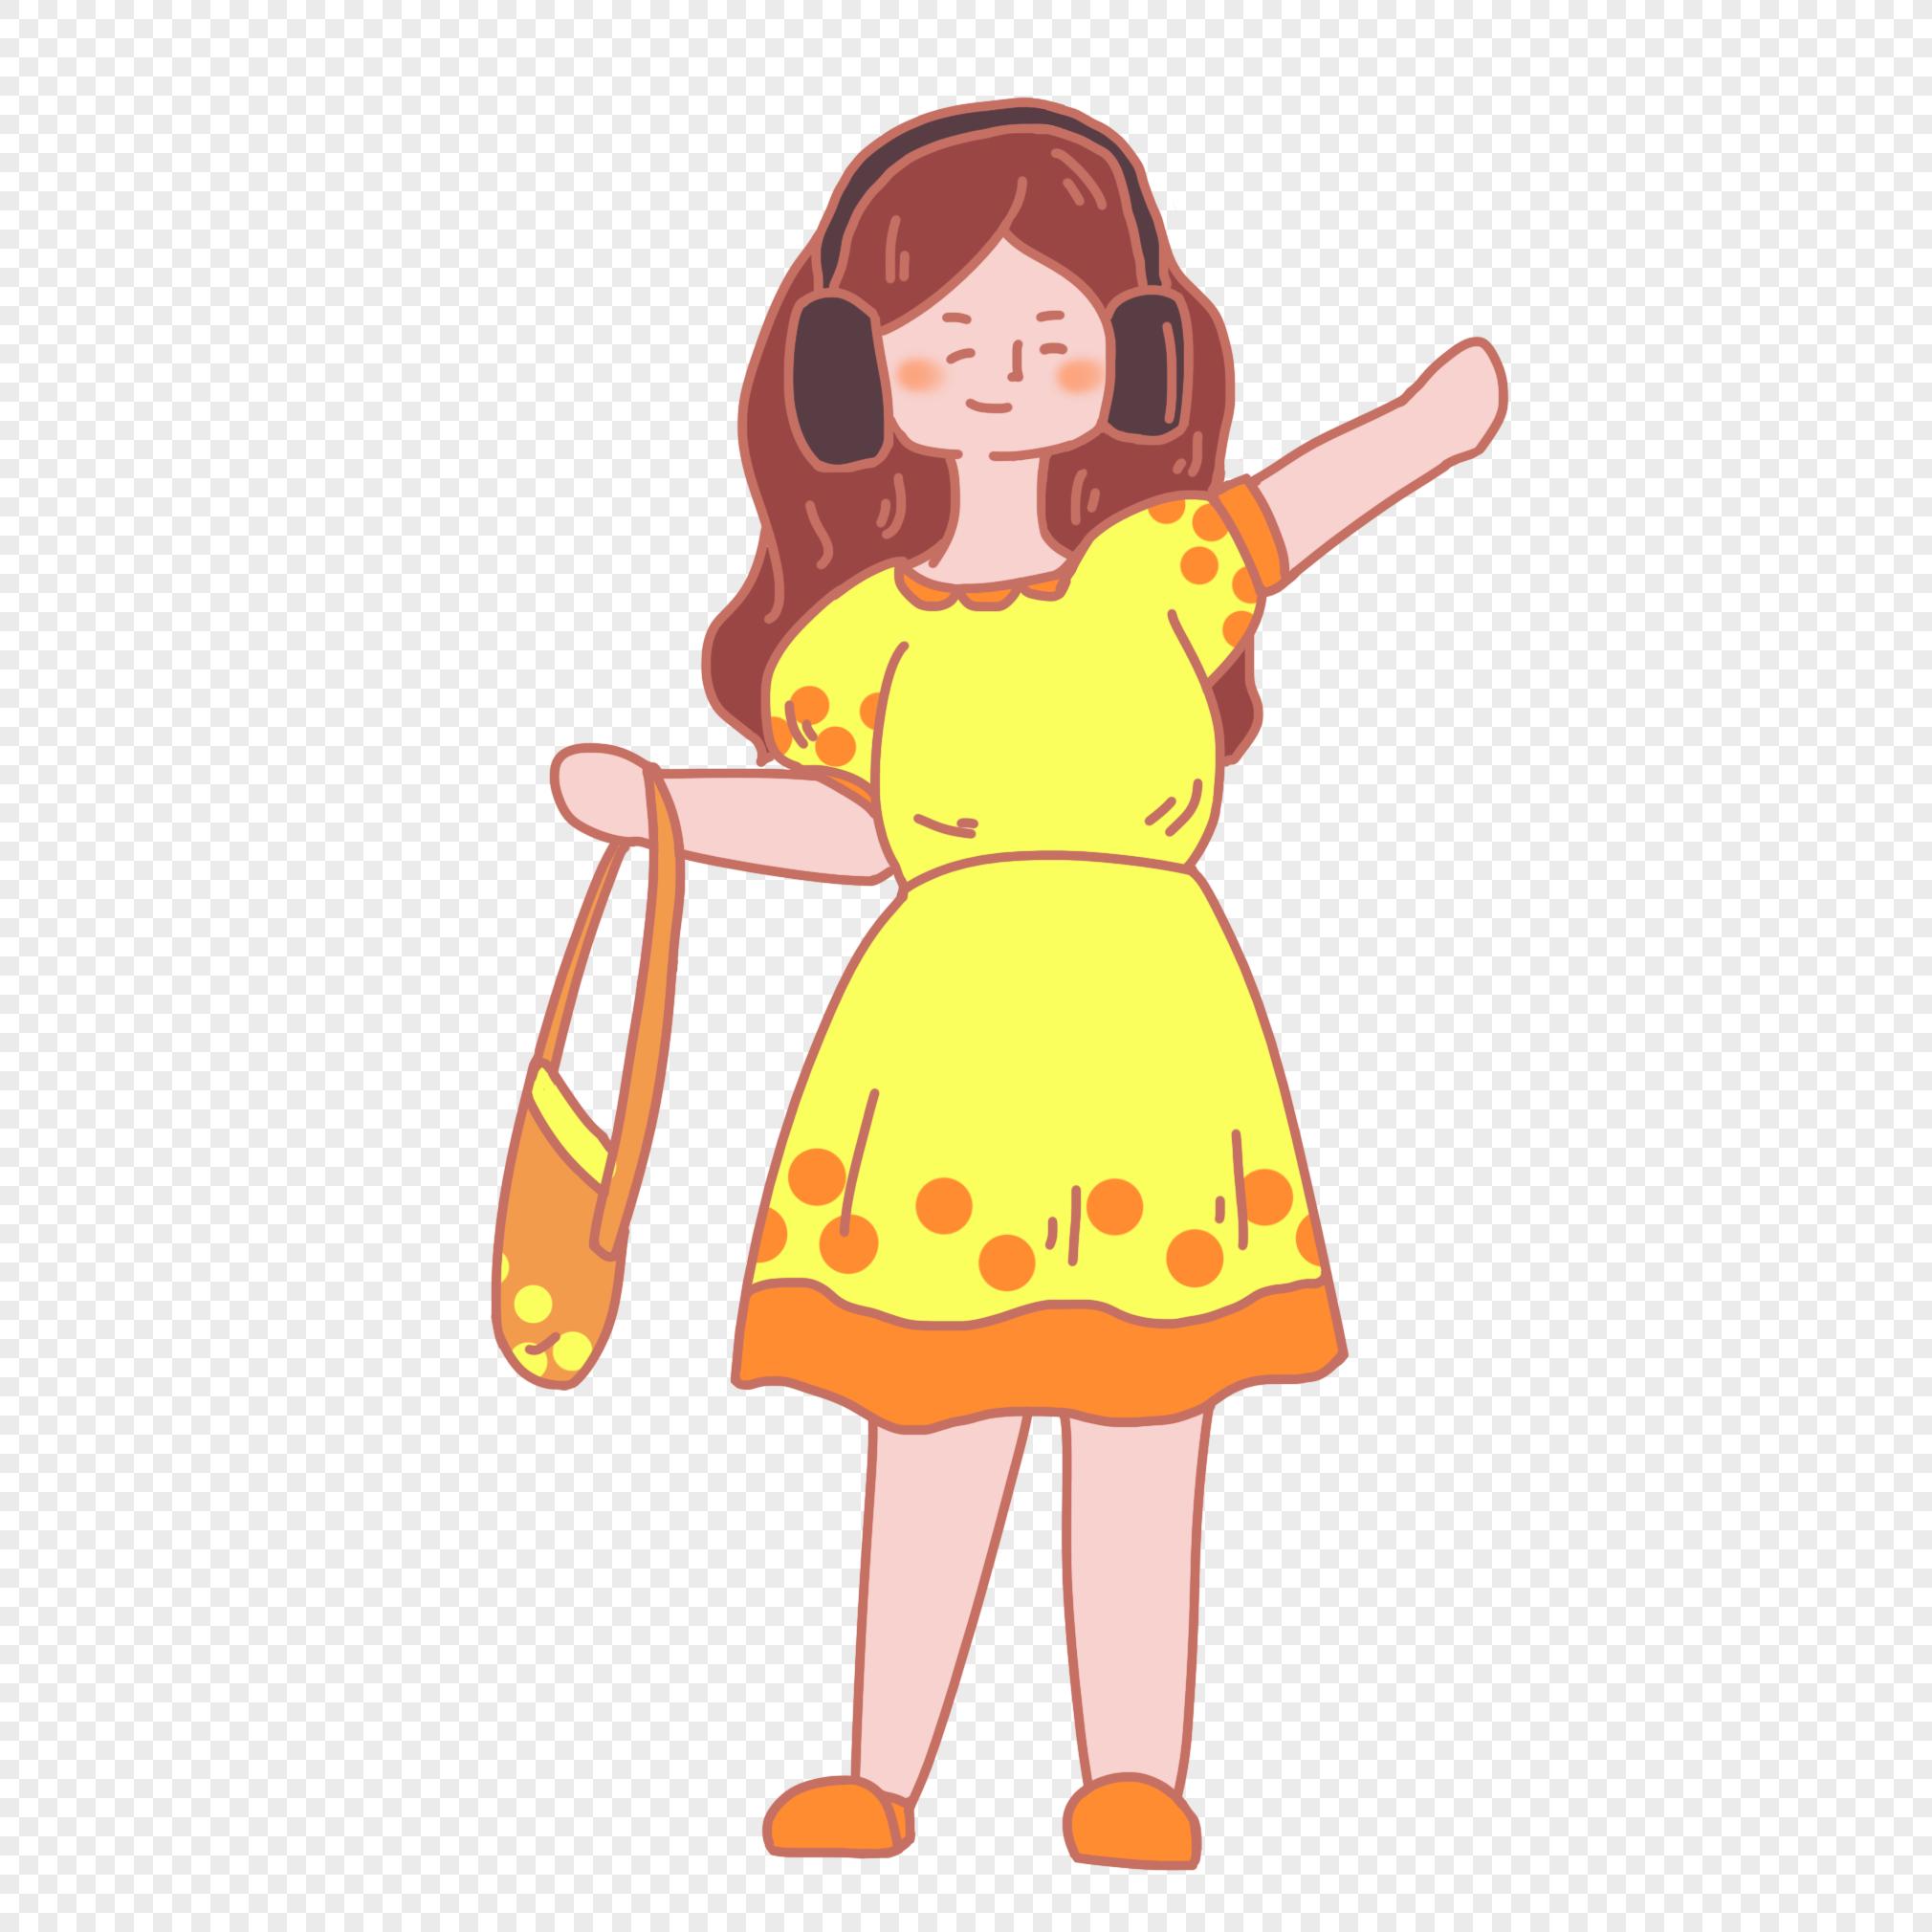 Girl Listening Music Cartoon Images